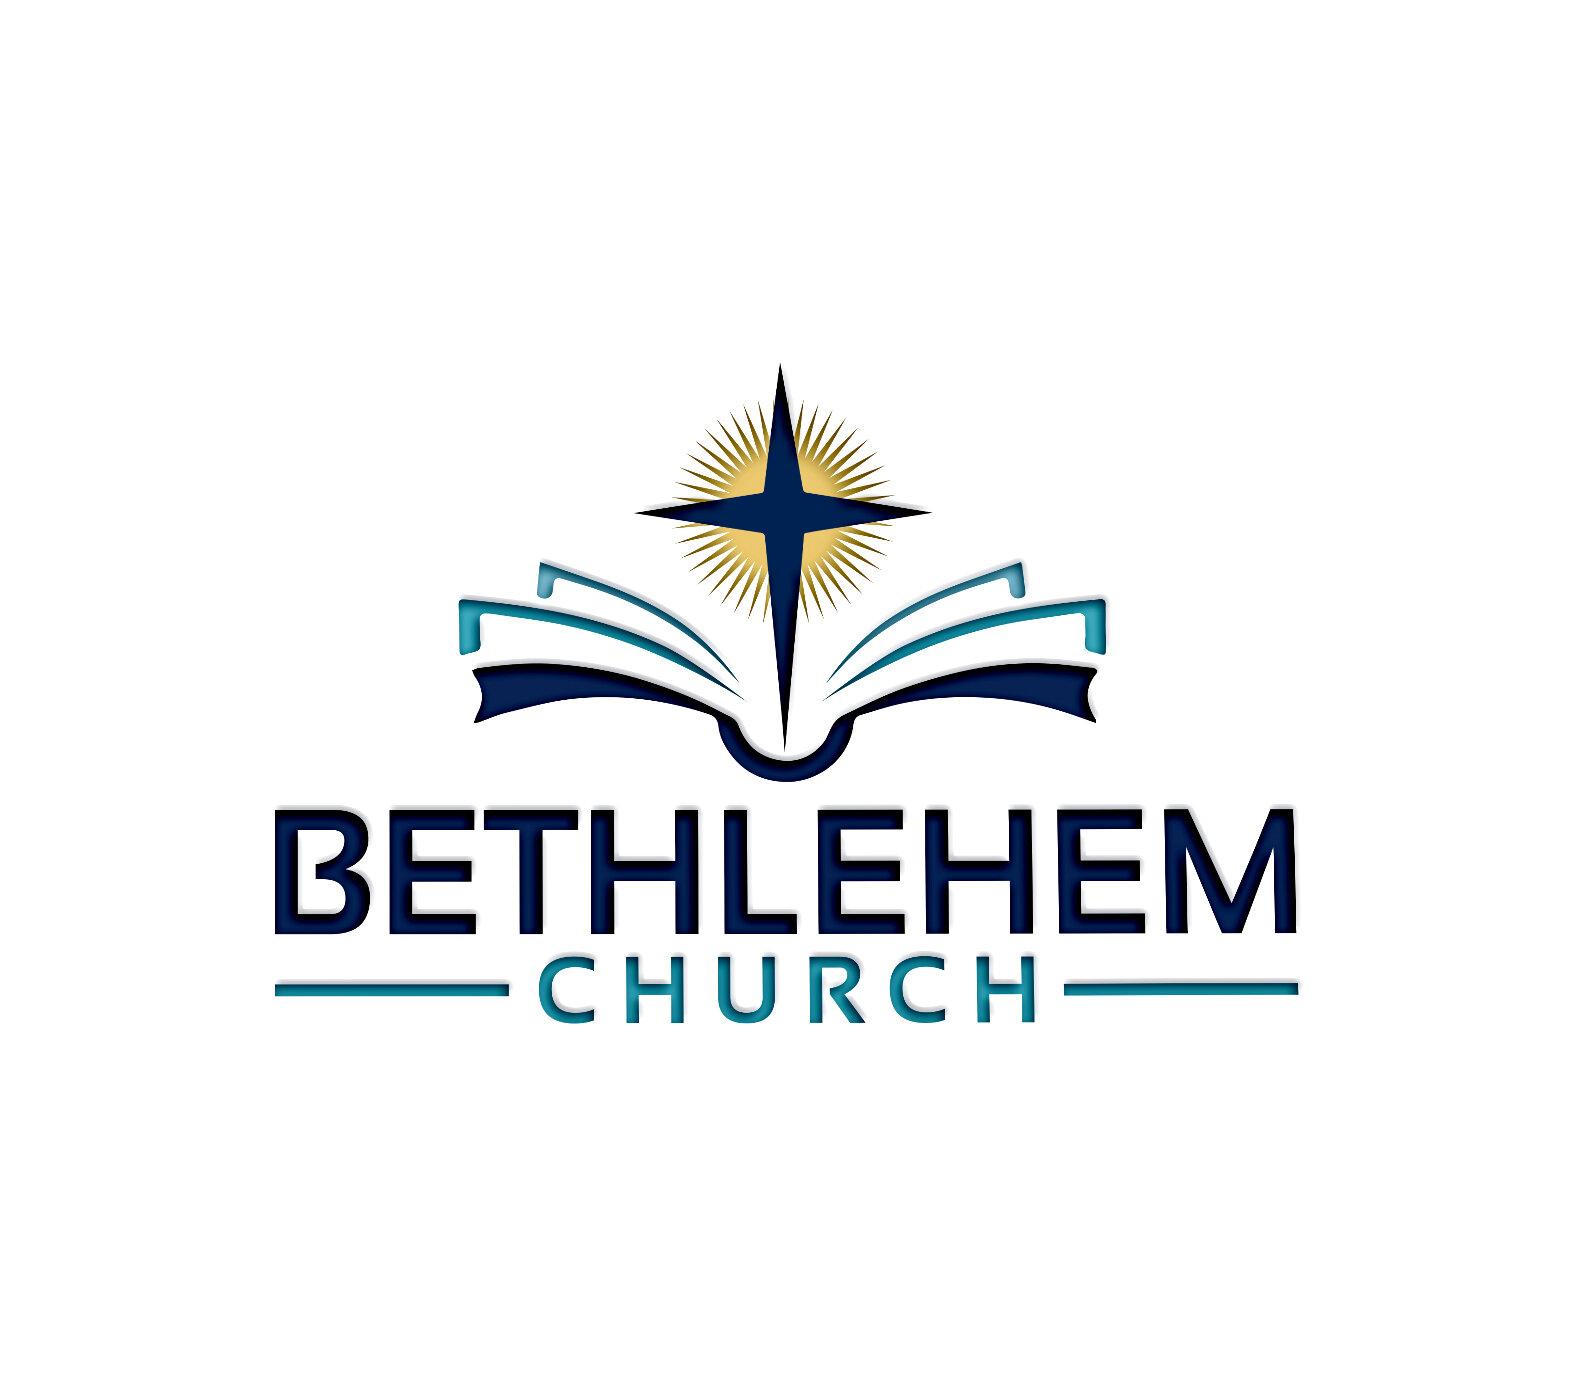 Bethlehem Church Officially Out of the UMC!